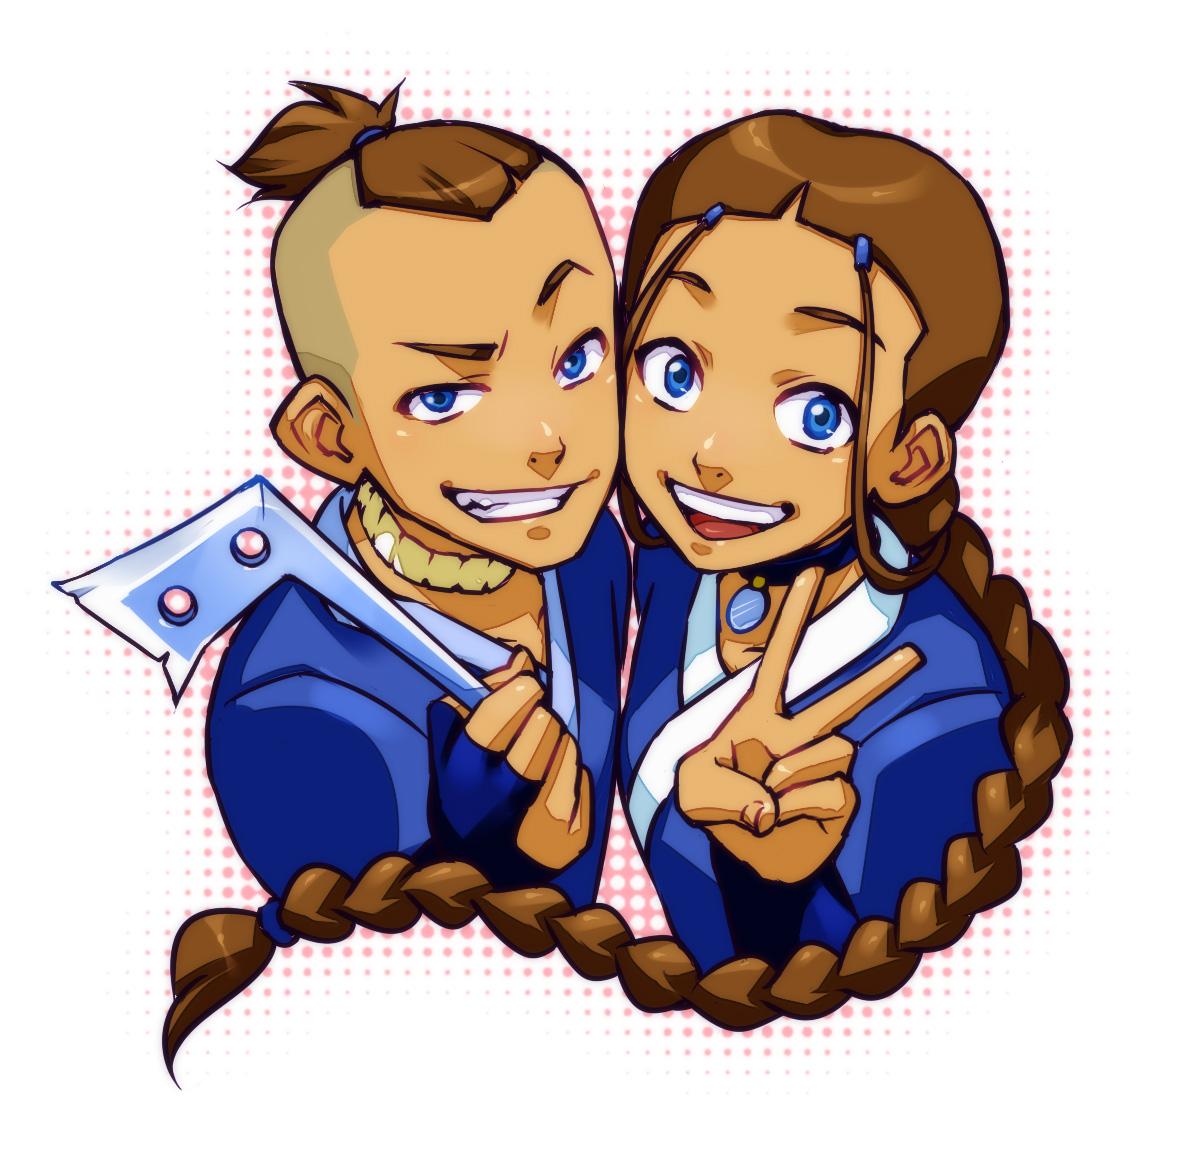 1 Avatar: Avatar: The Last Airbender Image #583374